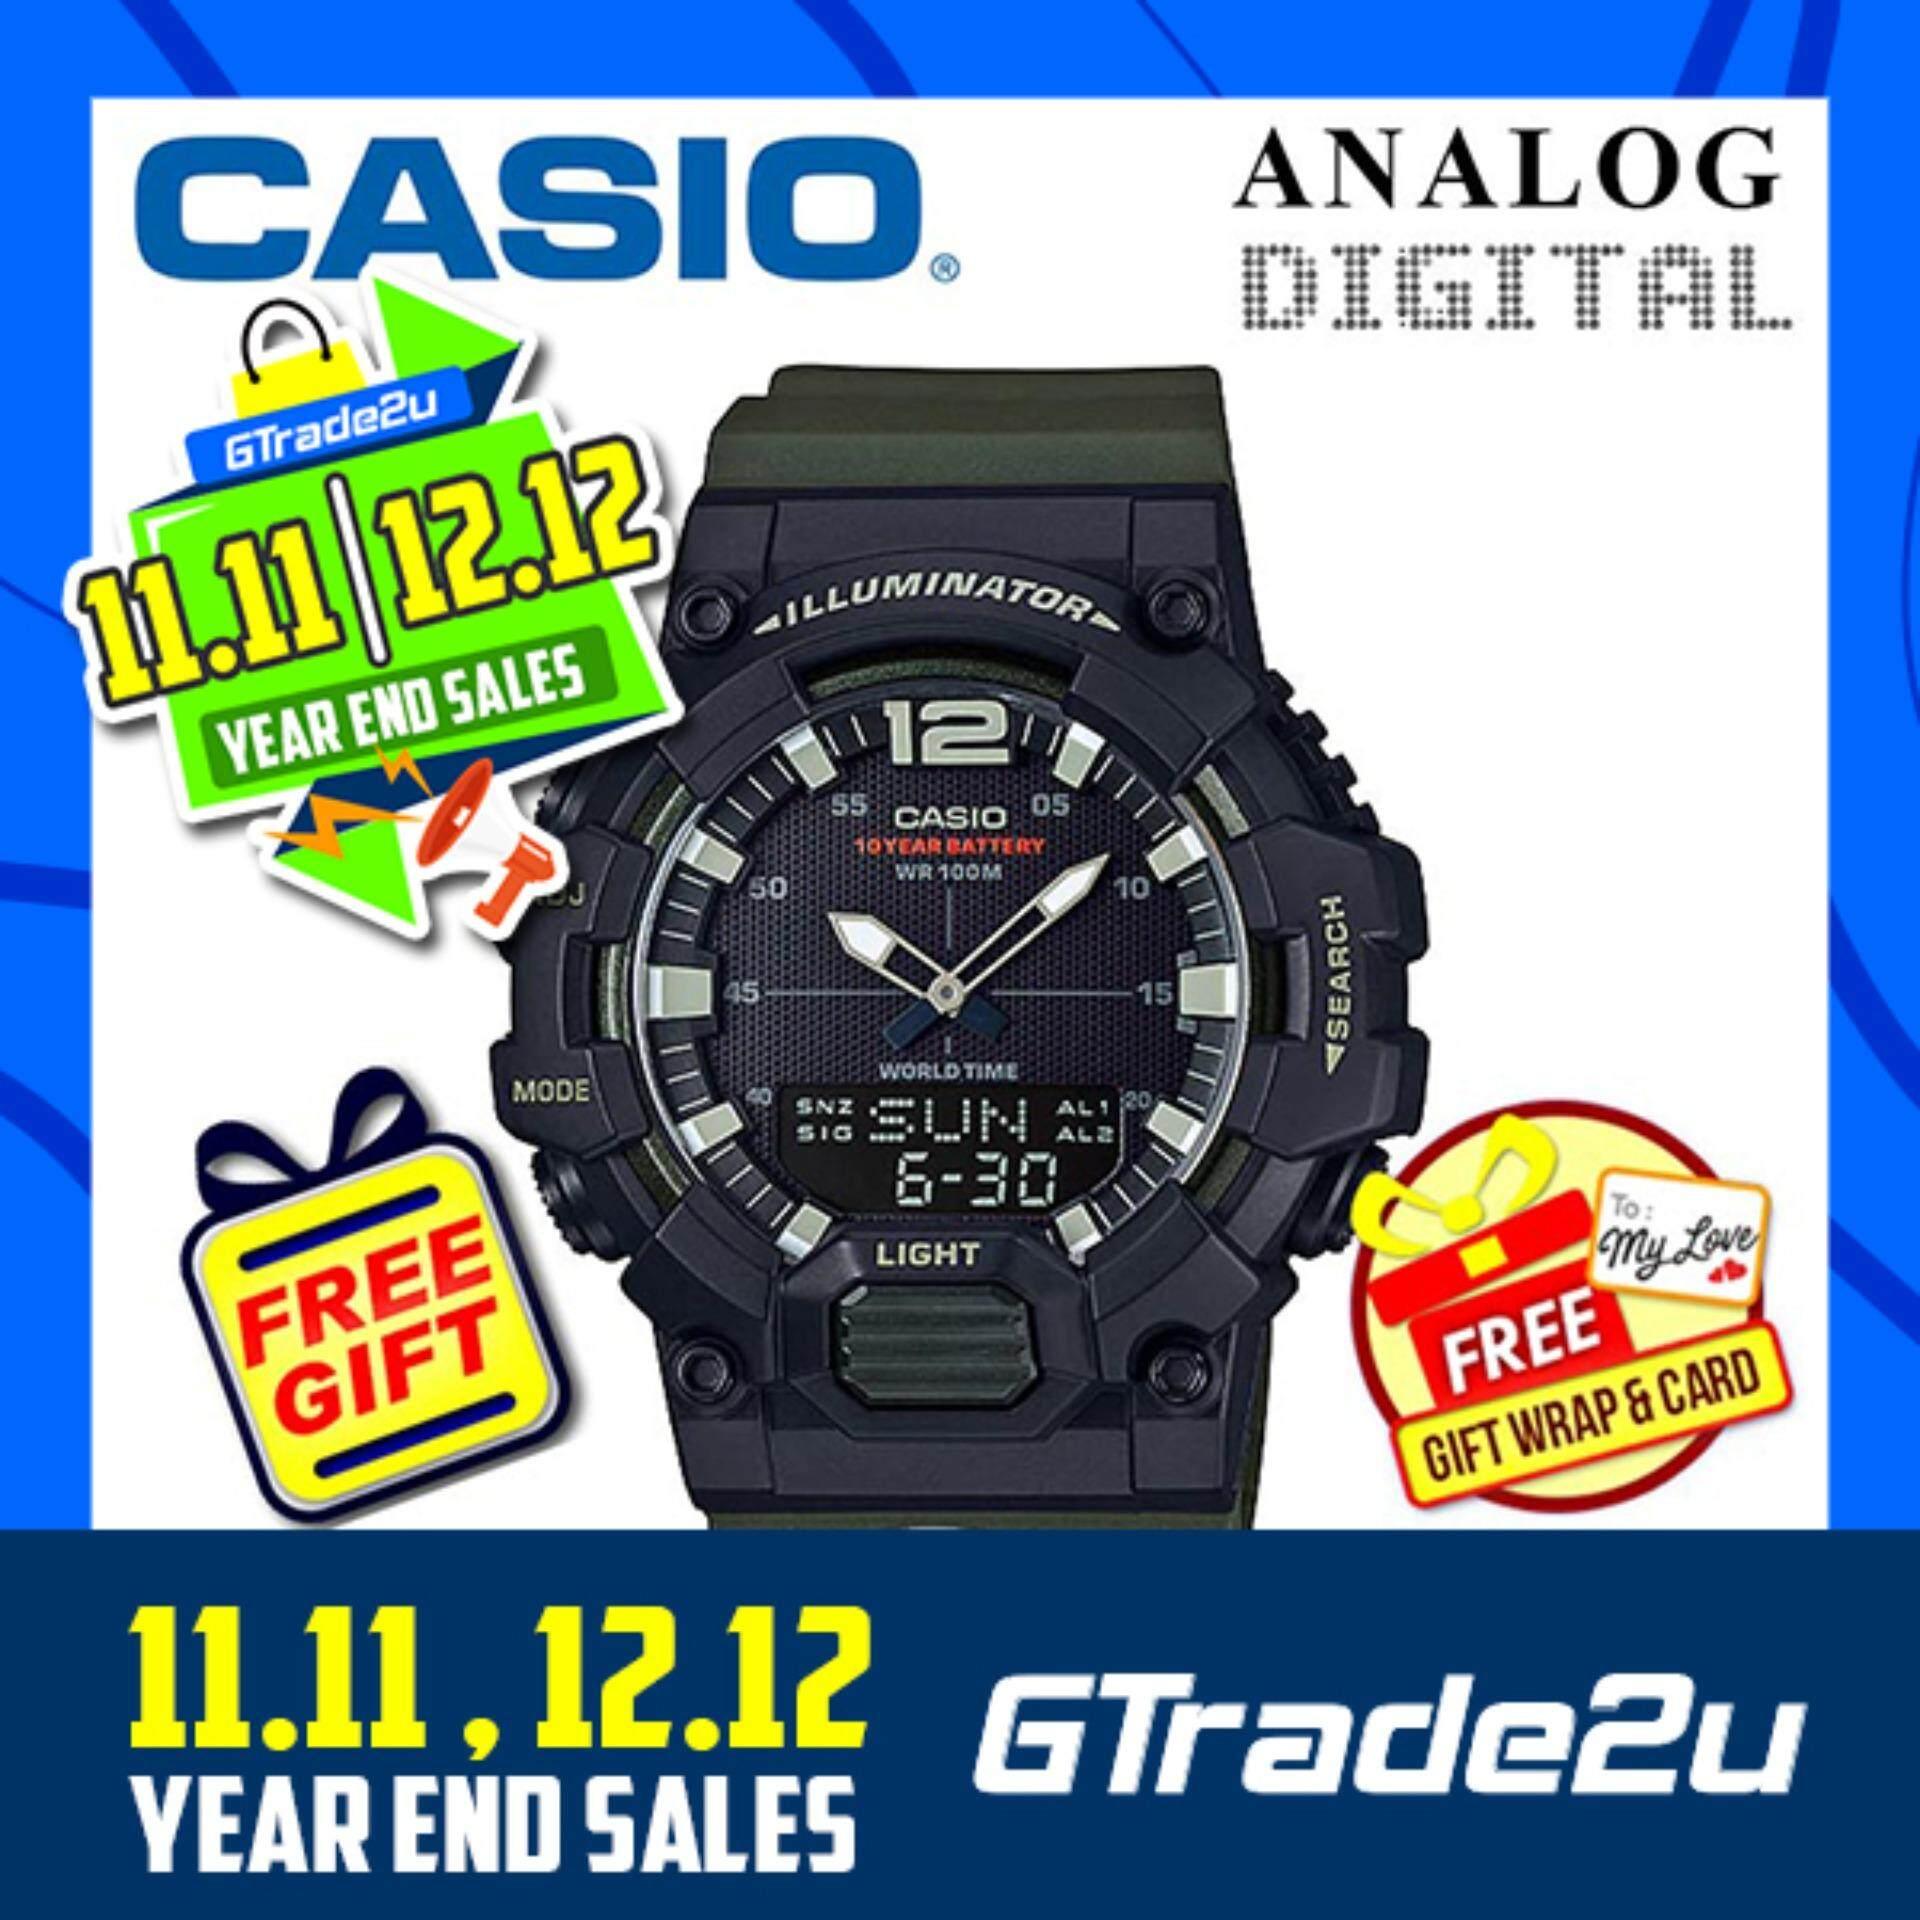 CASIO MEN HDC-700-3A Analog Digital Watch 10-Year Battery Jam Tangan Lelaki/Man Malaysia